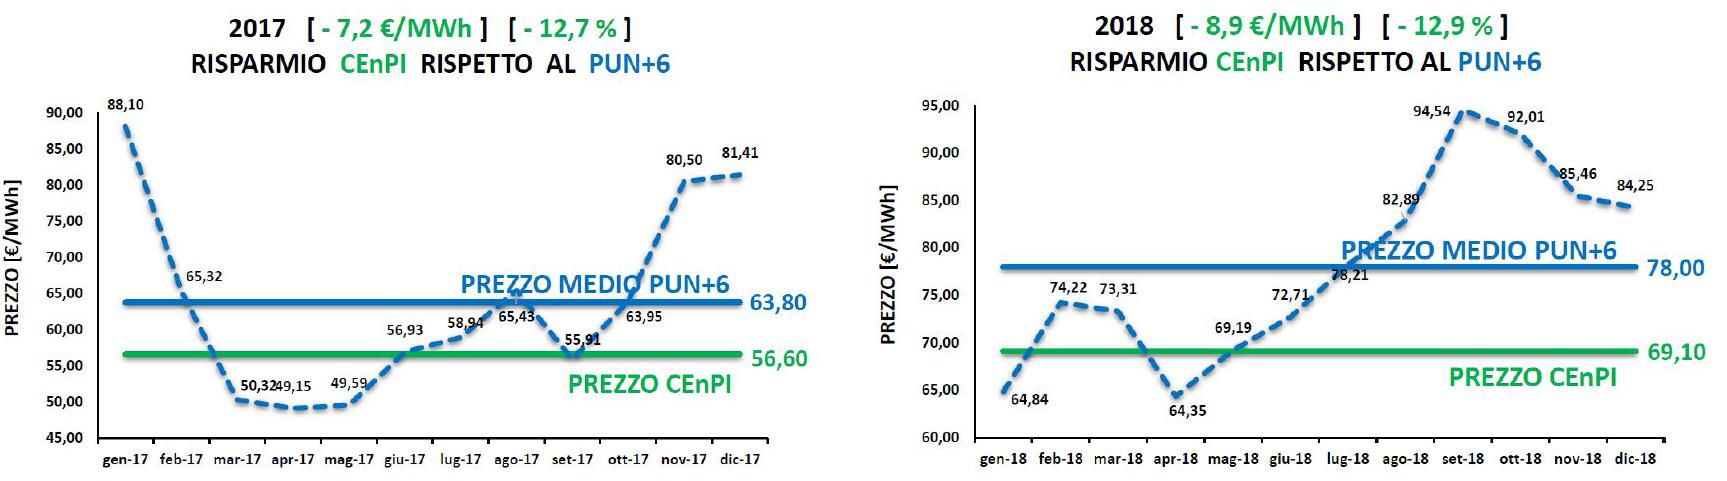 Risparmio CEnPI_PUN+6_17-18_web